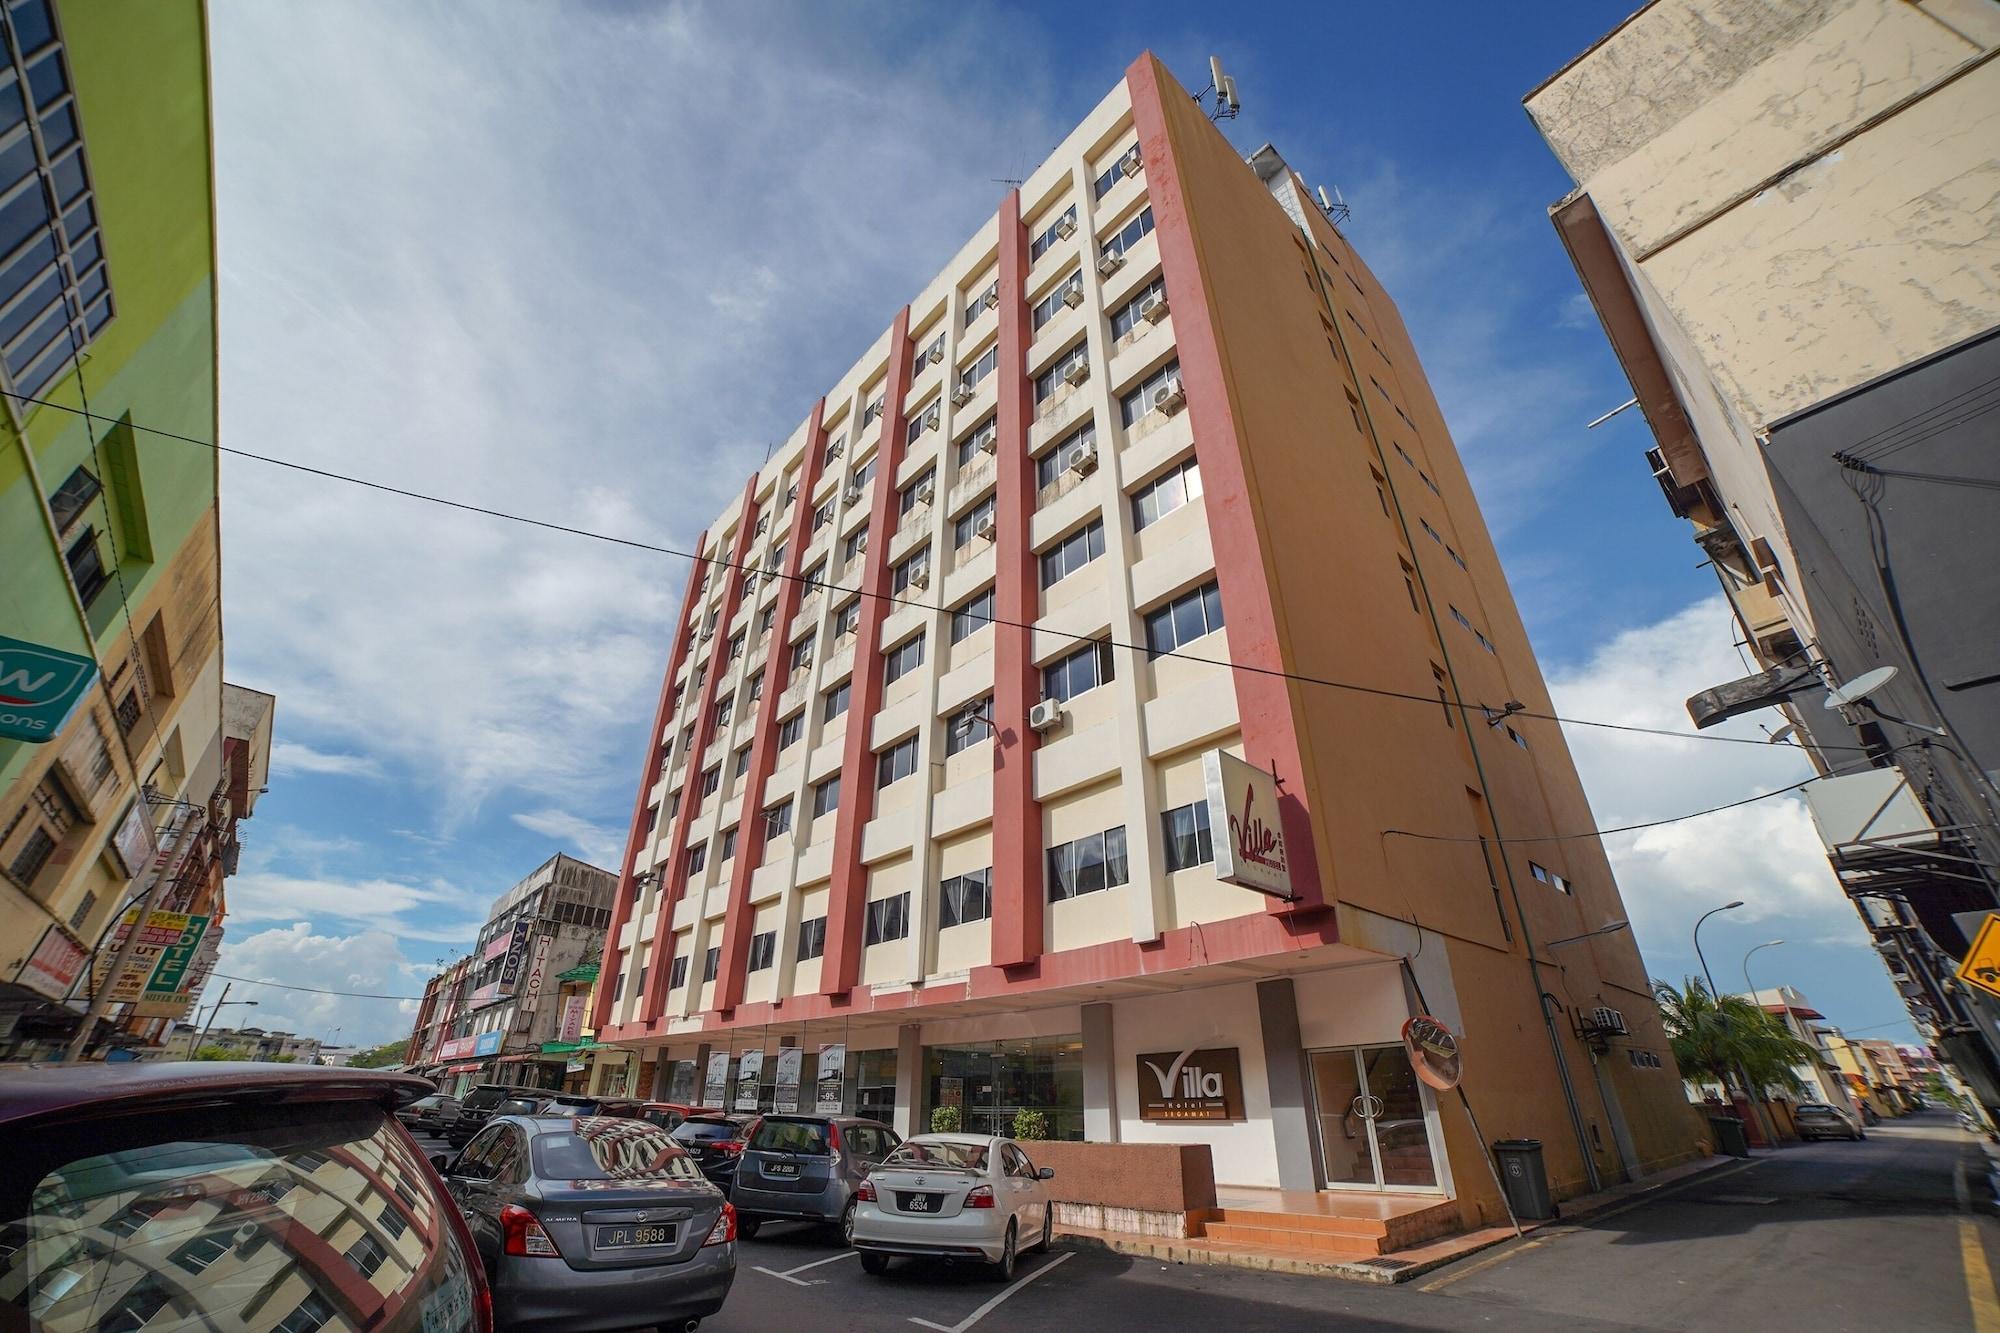 OYO 89531 Villa Hotel, Segamat